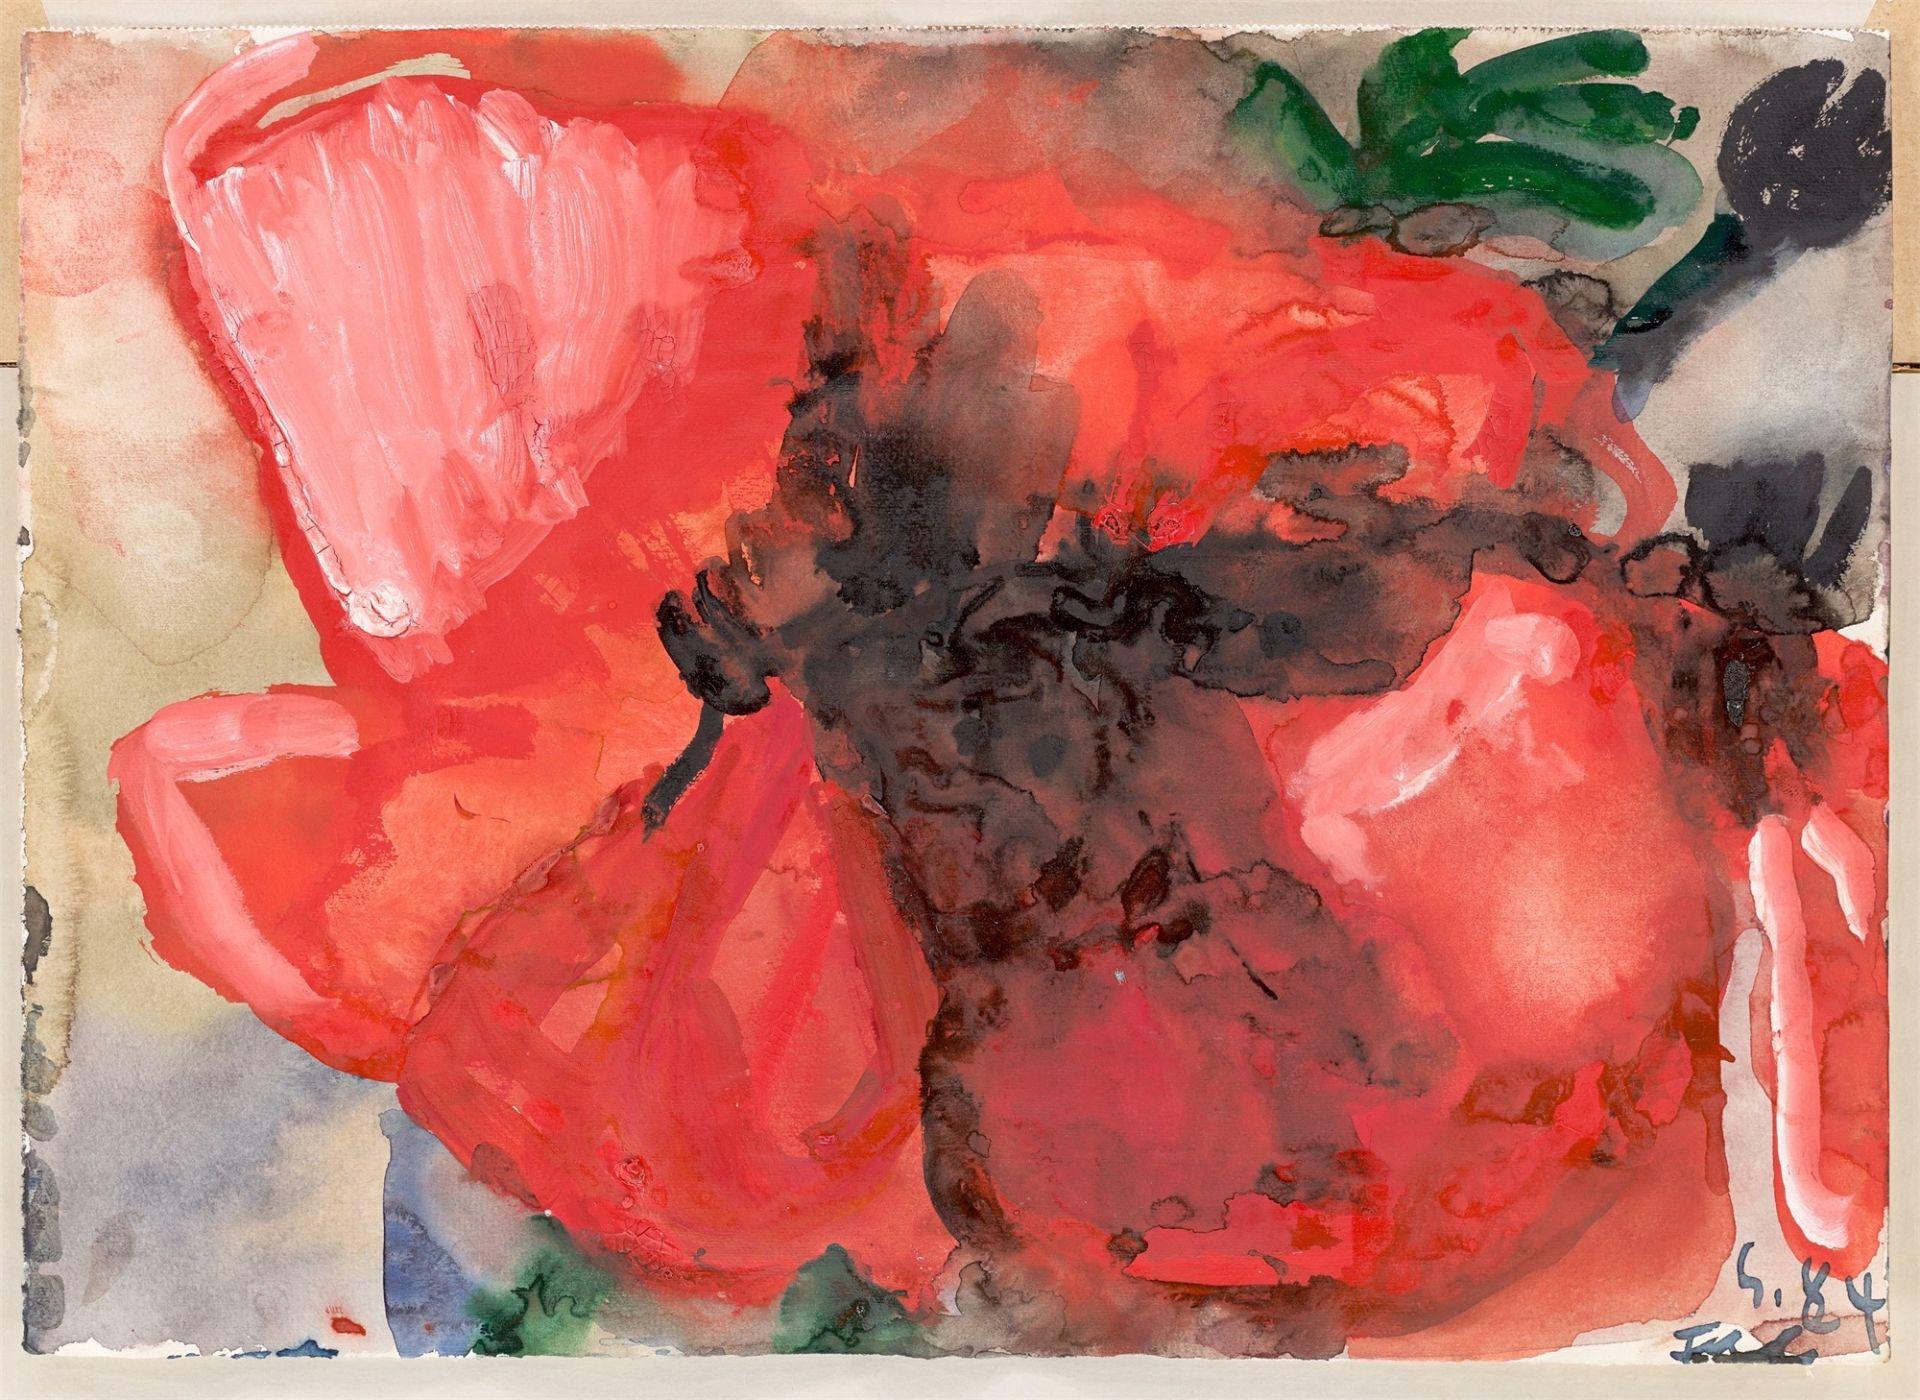 Klaus Fußmann. Poppy. 1984 - Image 2 of 4